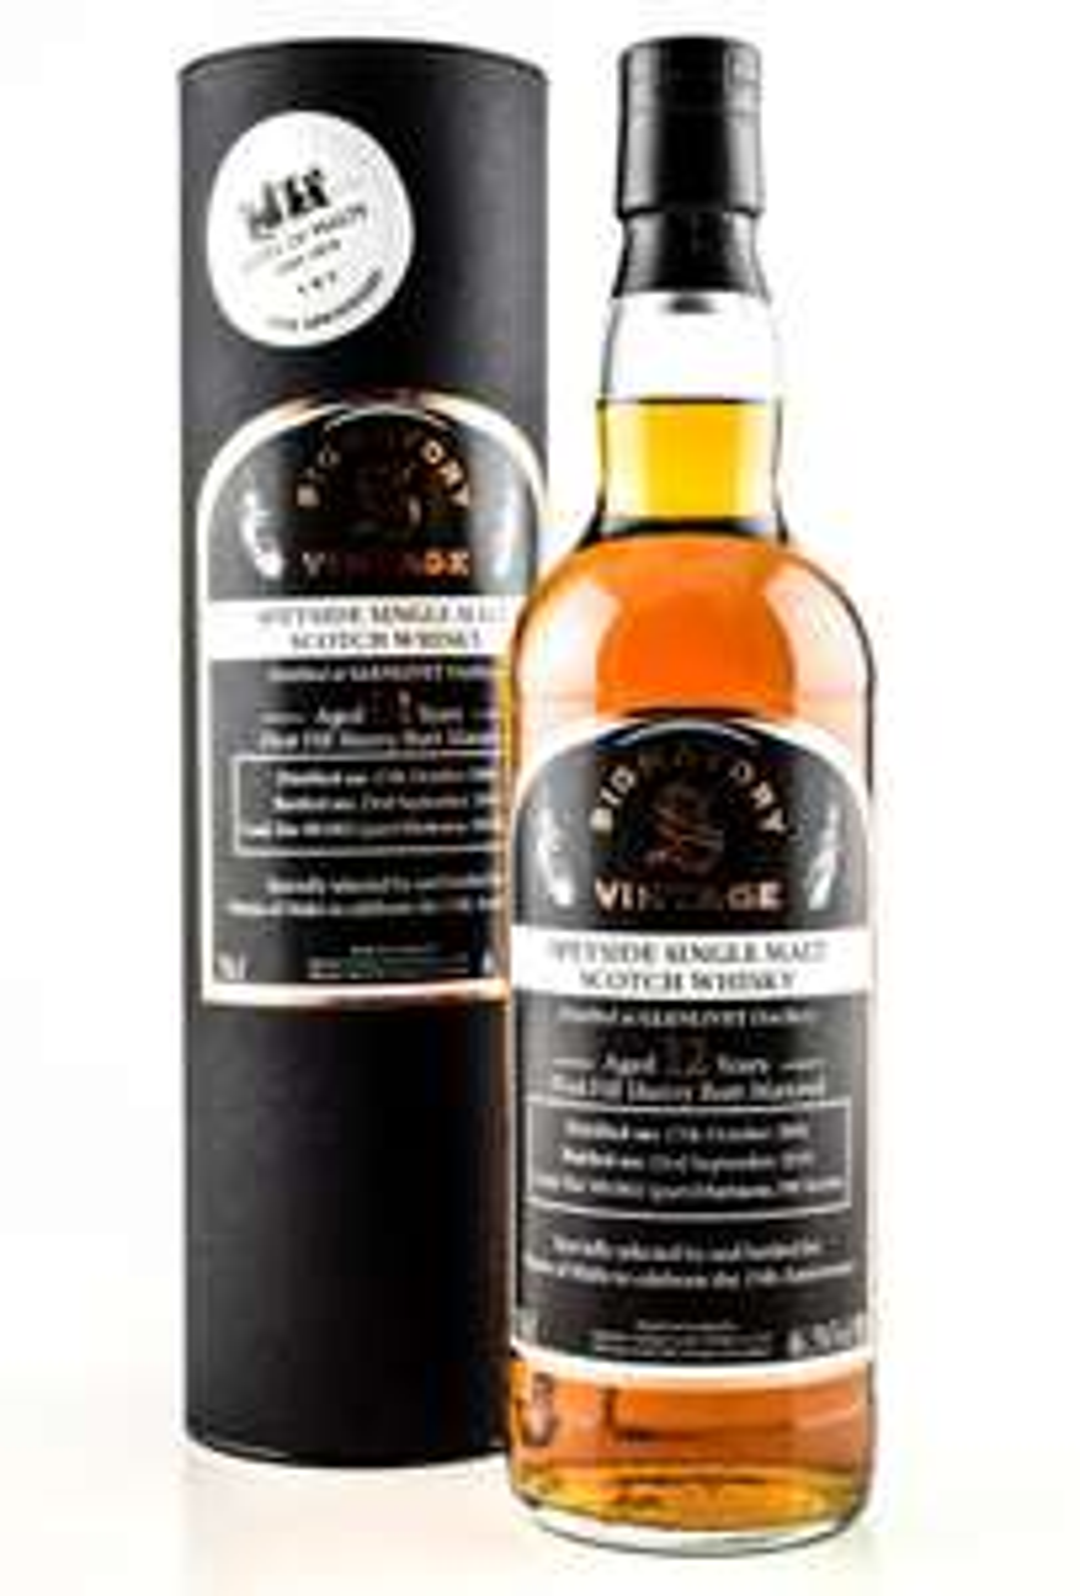 "[Home of Malts] Whisky ""Glenlivet 12 Jahre 1st-fill Sherry Butt 15th Anniversary"" Signatory 46,3%vol. 0,7l / limitierte Edition 390 Flaschen"